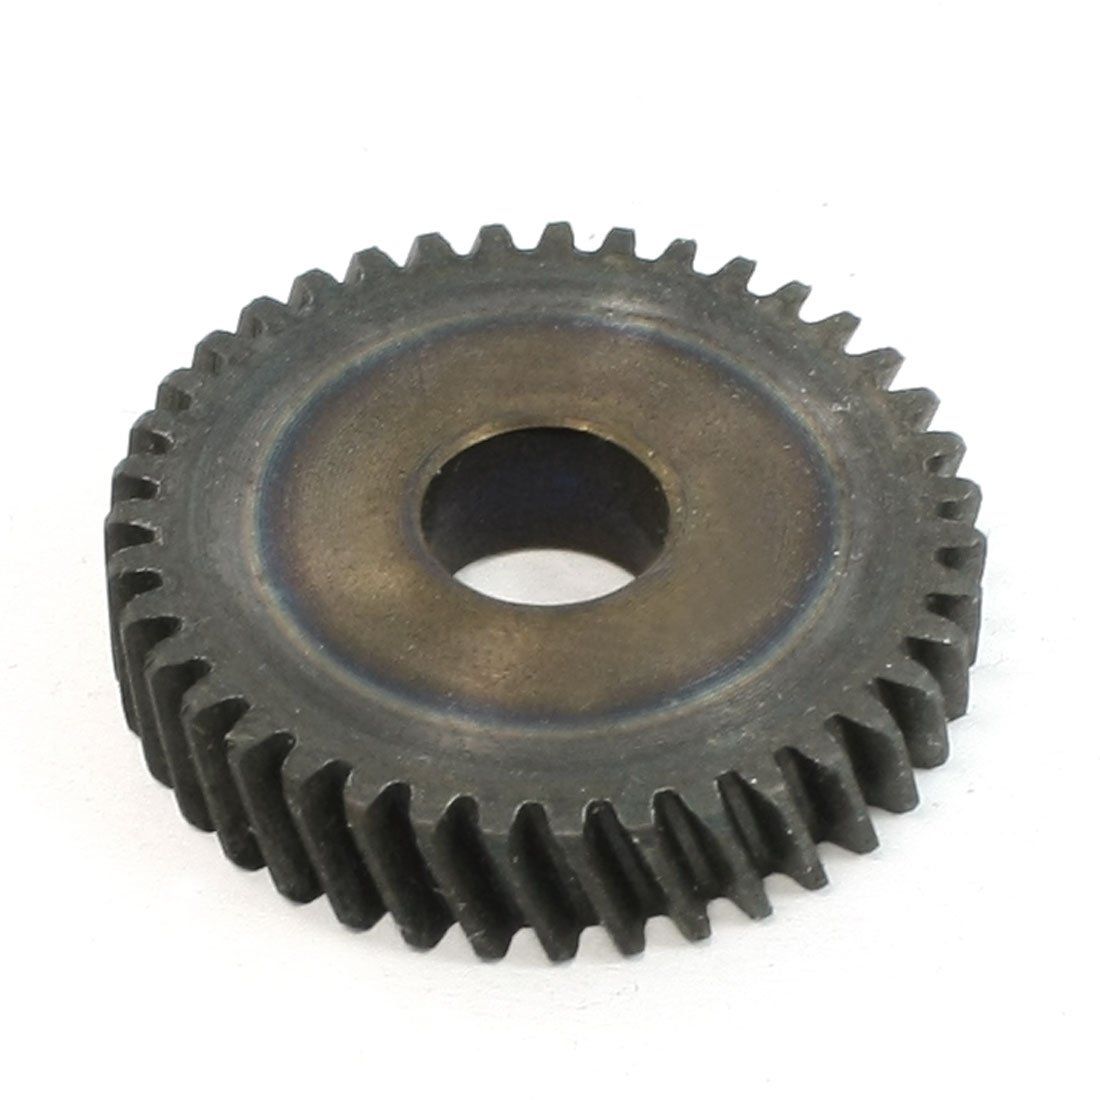 43mm OD 12mm Inner Diameter 39 Teeth Gear Wheel for Hitachi 10VA Electric Drill